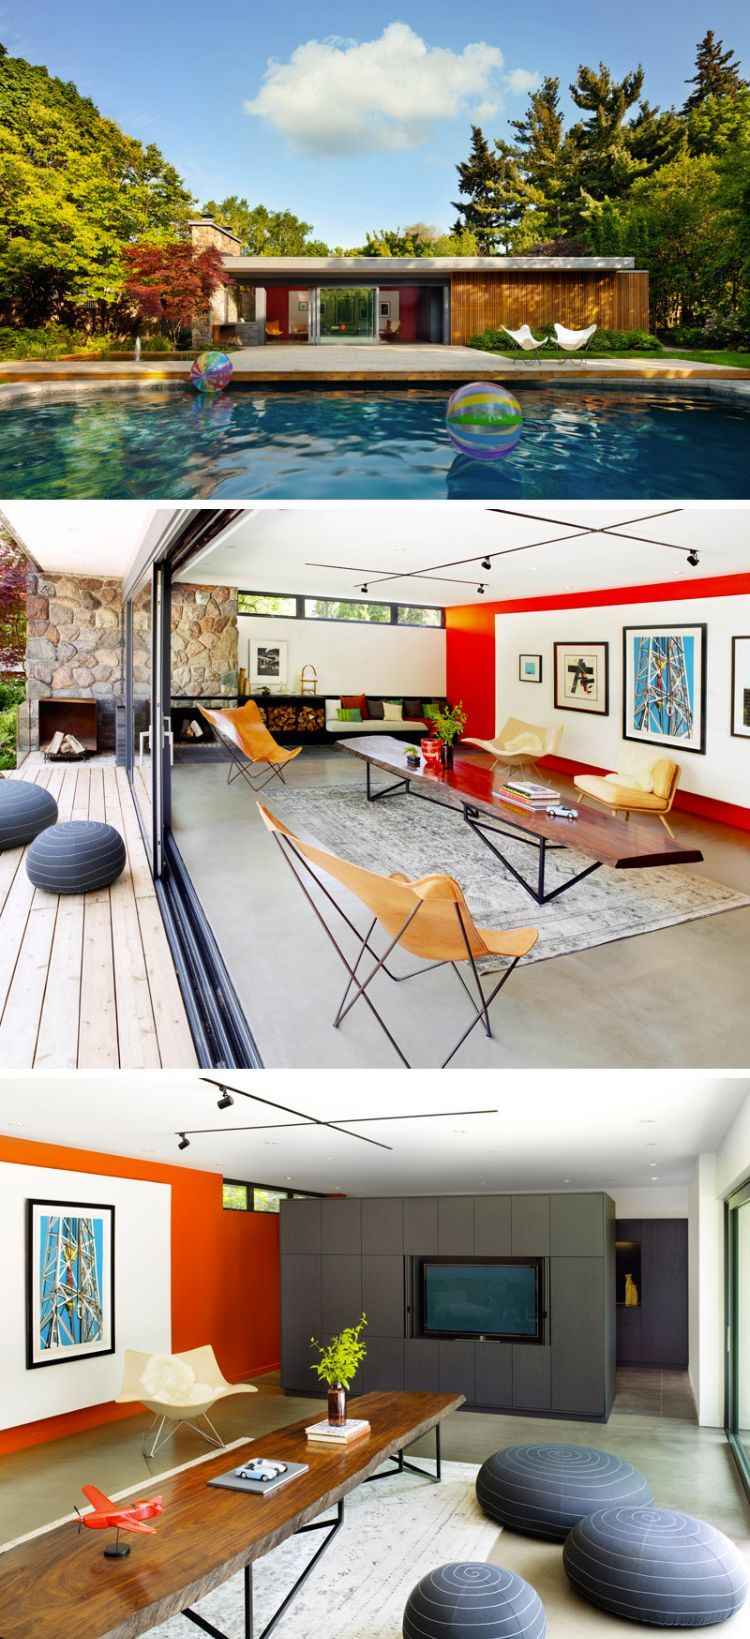 Poolhaus im Retro-Design | Minimalist house architecture | Pinterest ...